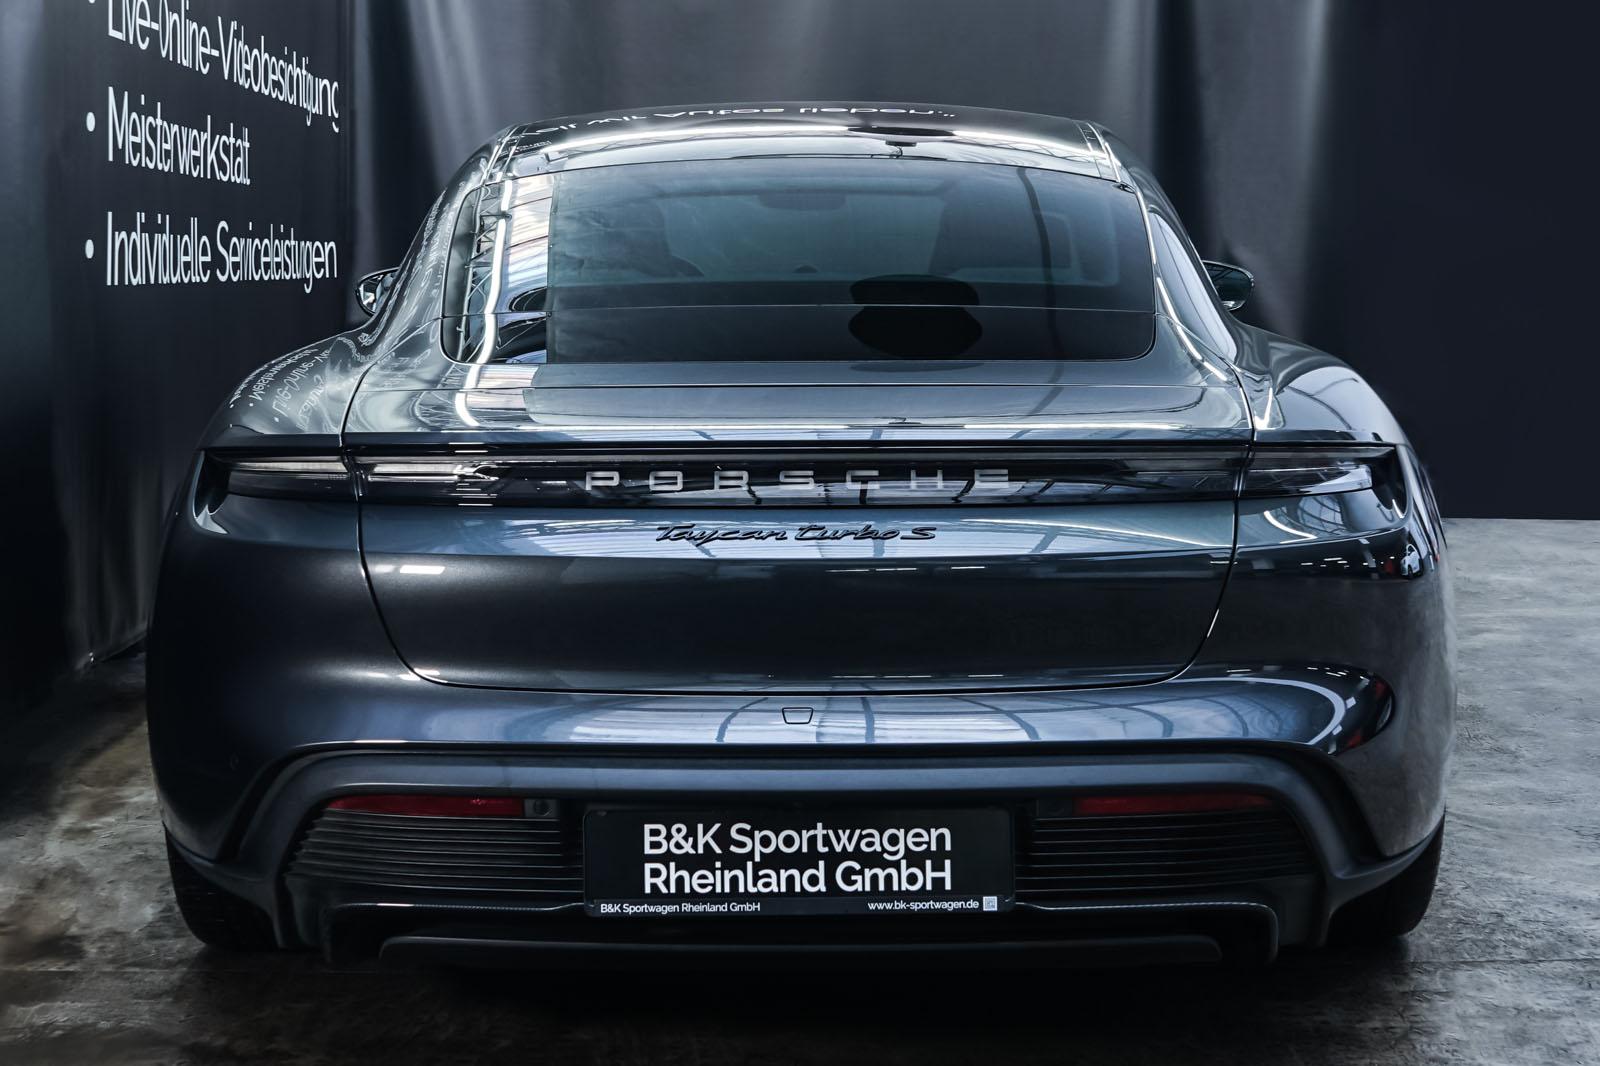 Porsche_Taycan_TurboS_Grau_Schwarz_POR-5353_15_w